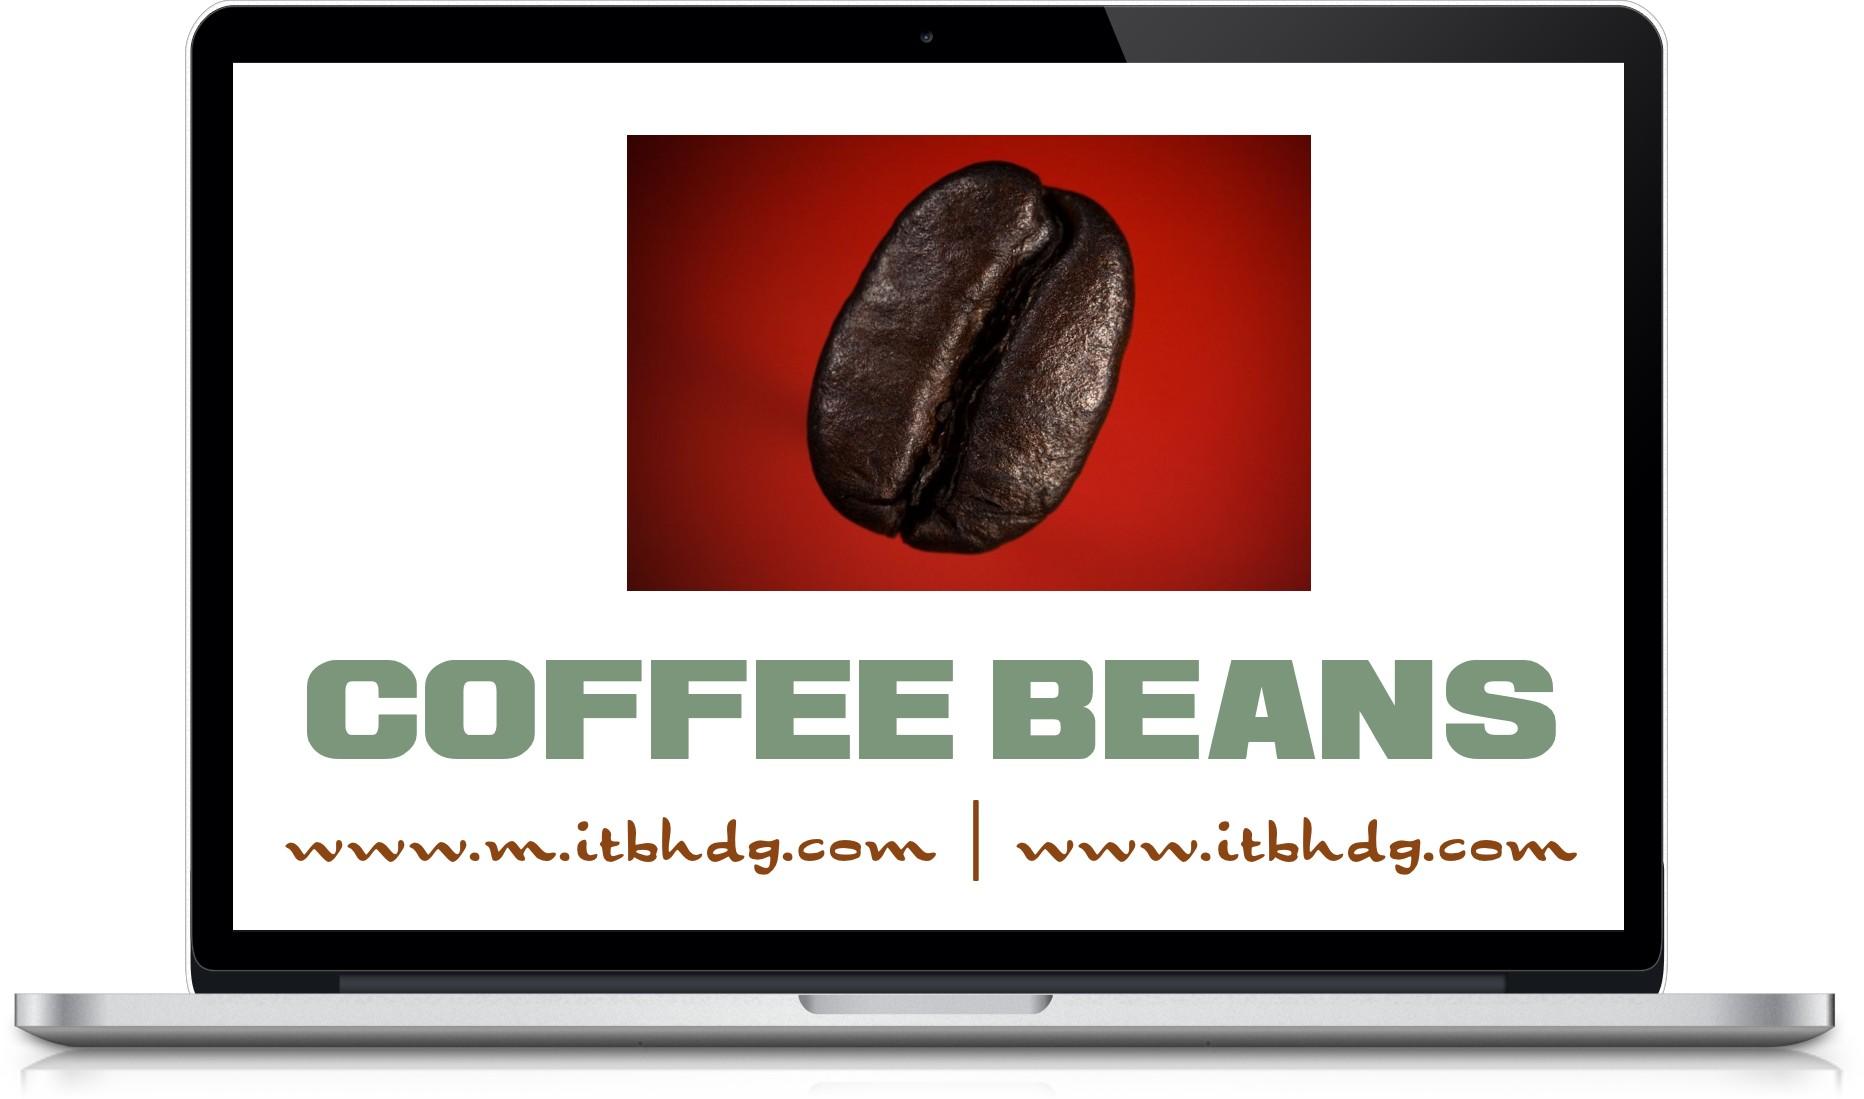 Green coffee, gourmet coffee, organic coffee, micro-lots | www.m.itbhdg.com | www.itbhdg.com